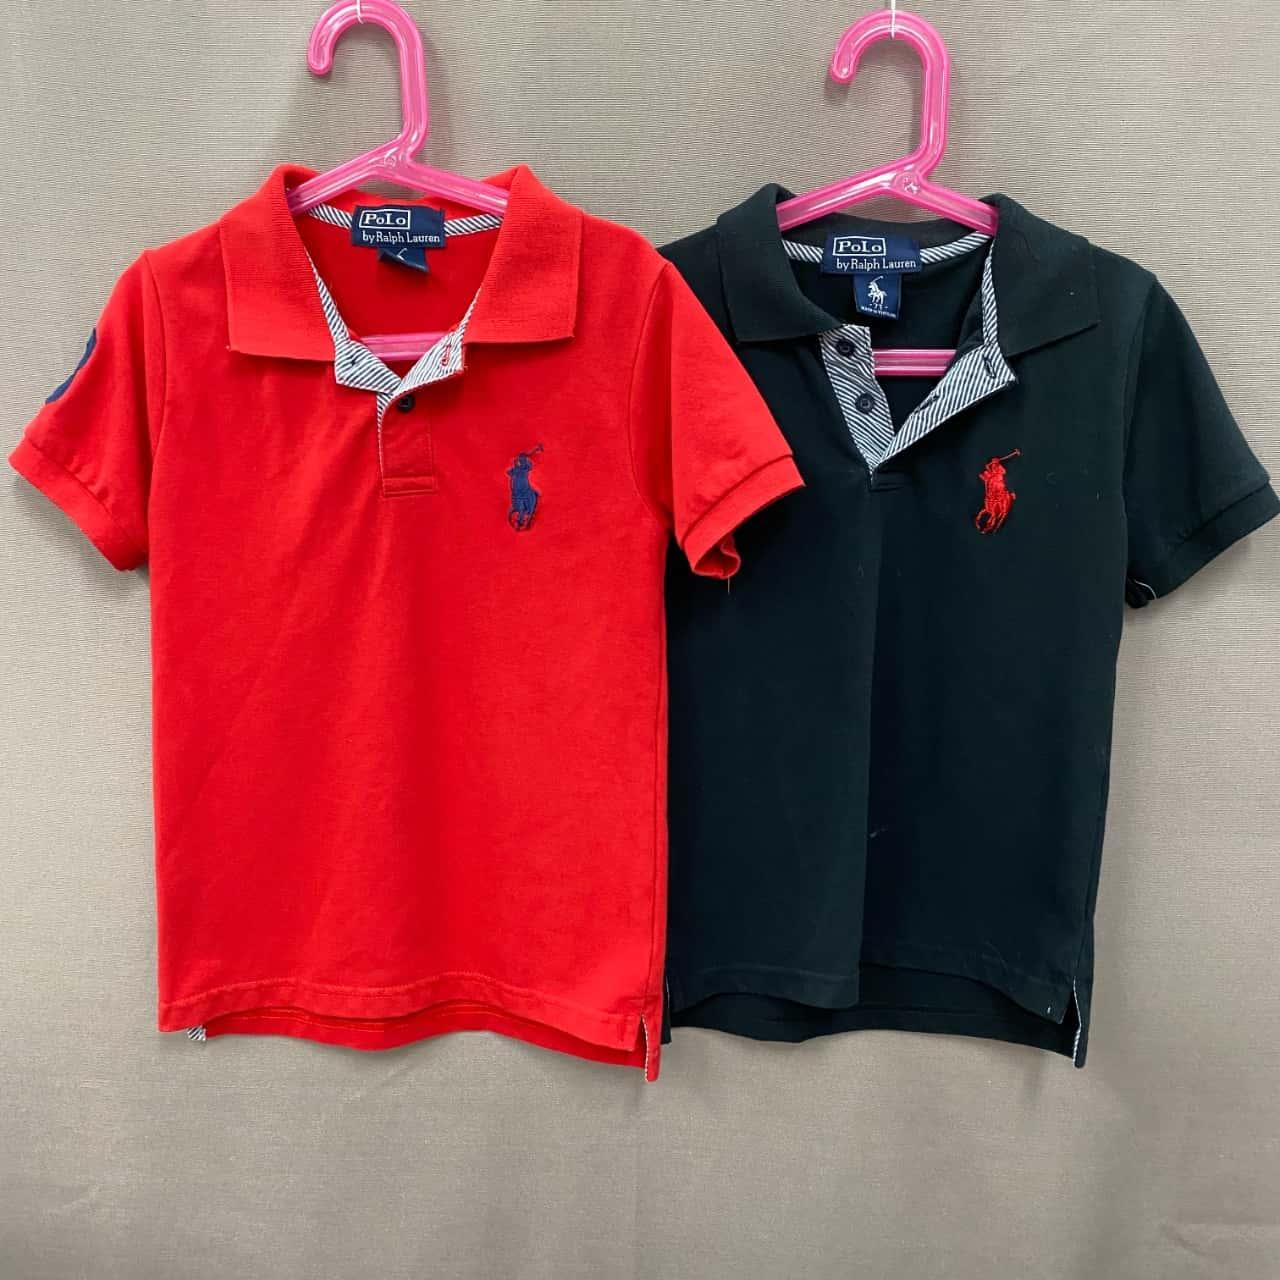 Polo Ralph Lauren Kids Polo Shirt Pair Size 7 Black /Red